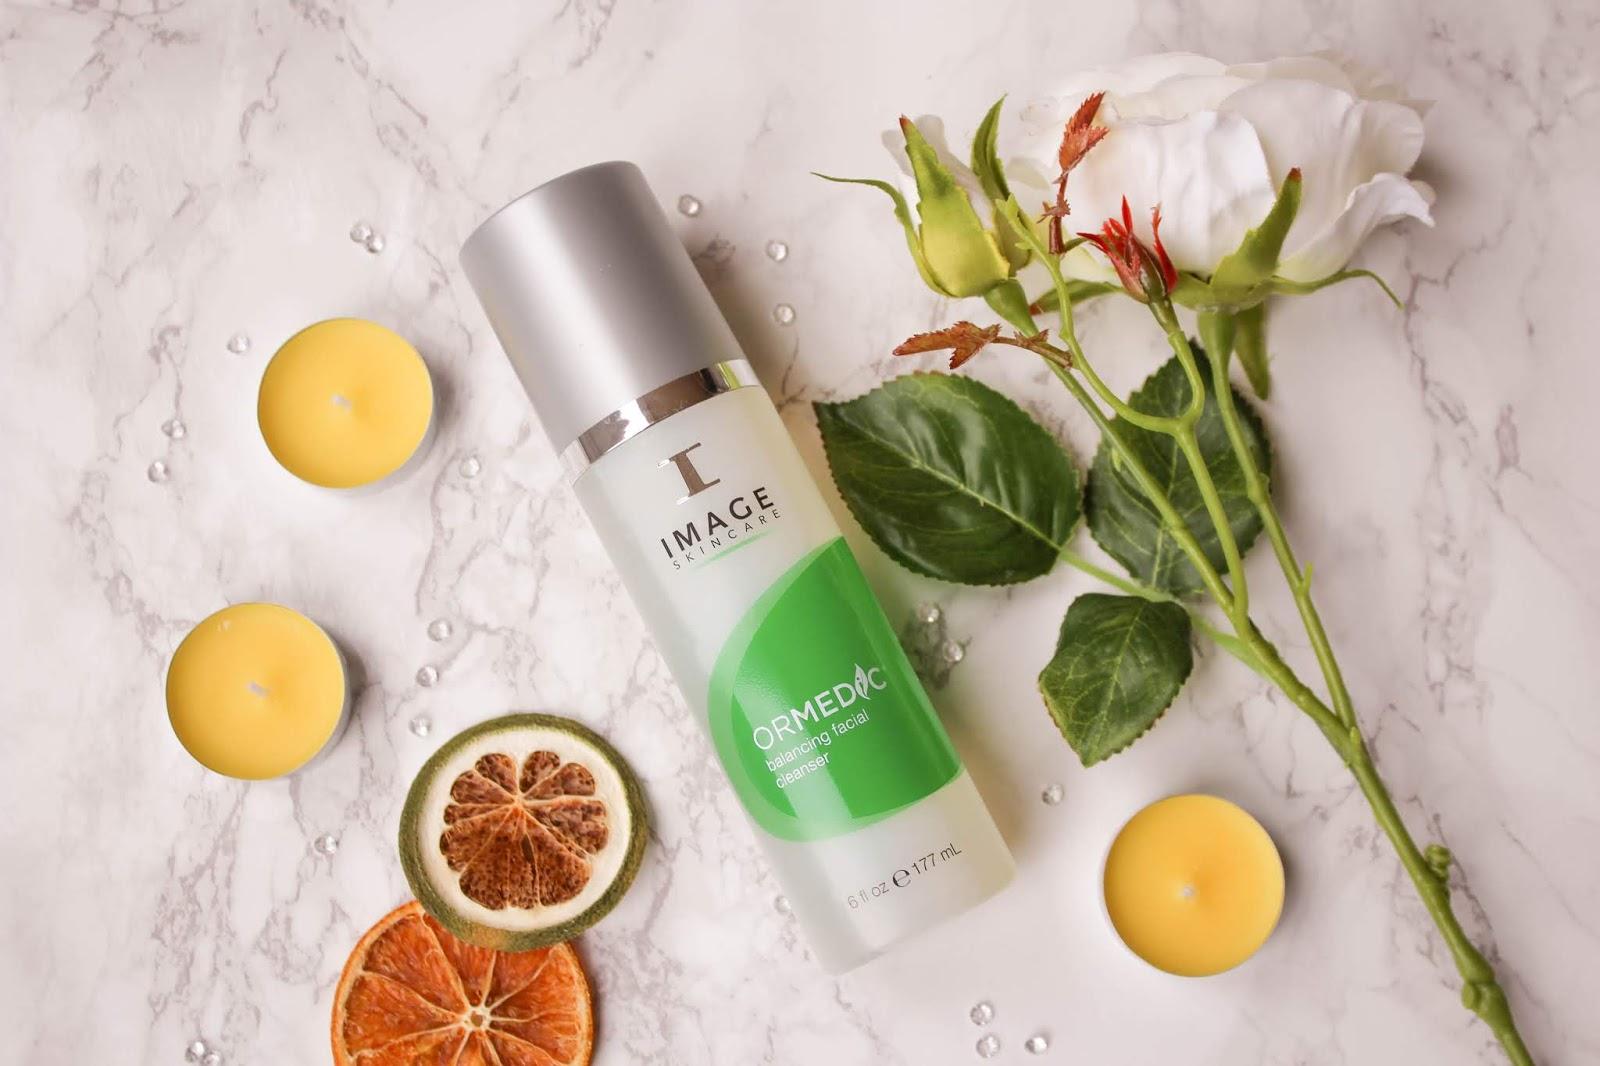 Image Skincare Ormedic Balancing Facial Cleanser Review